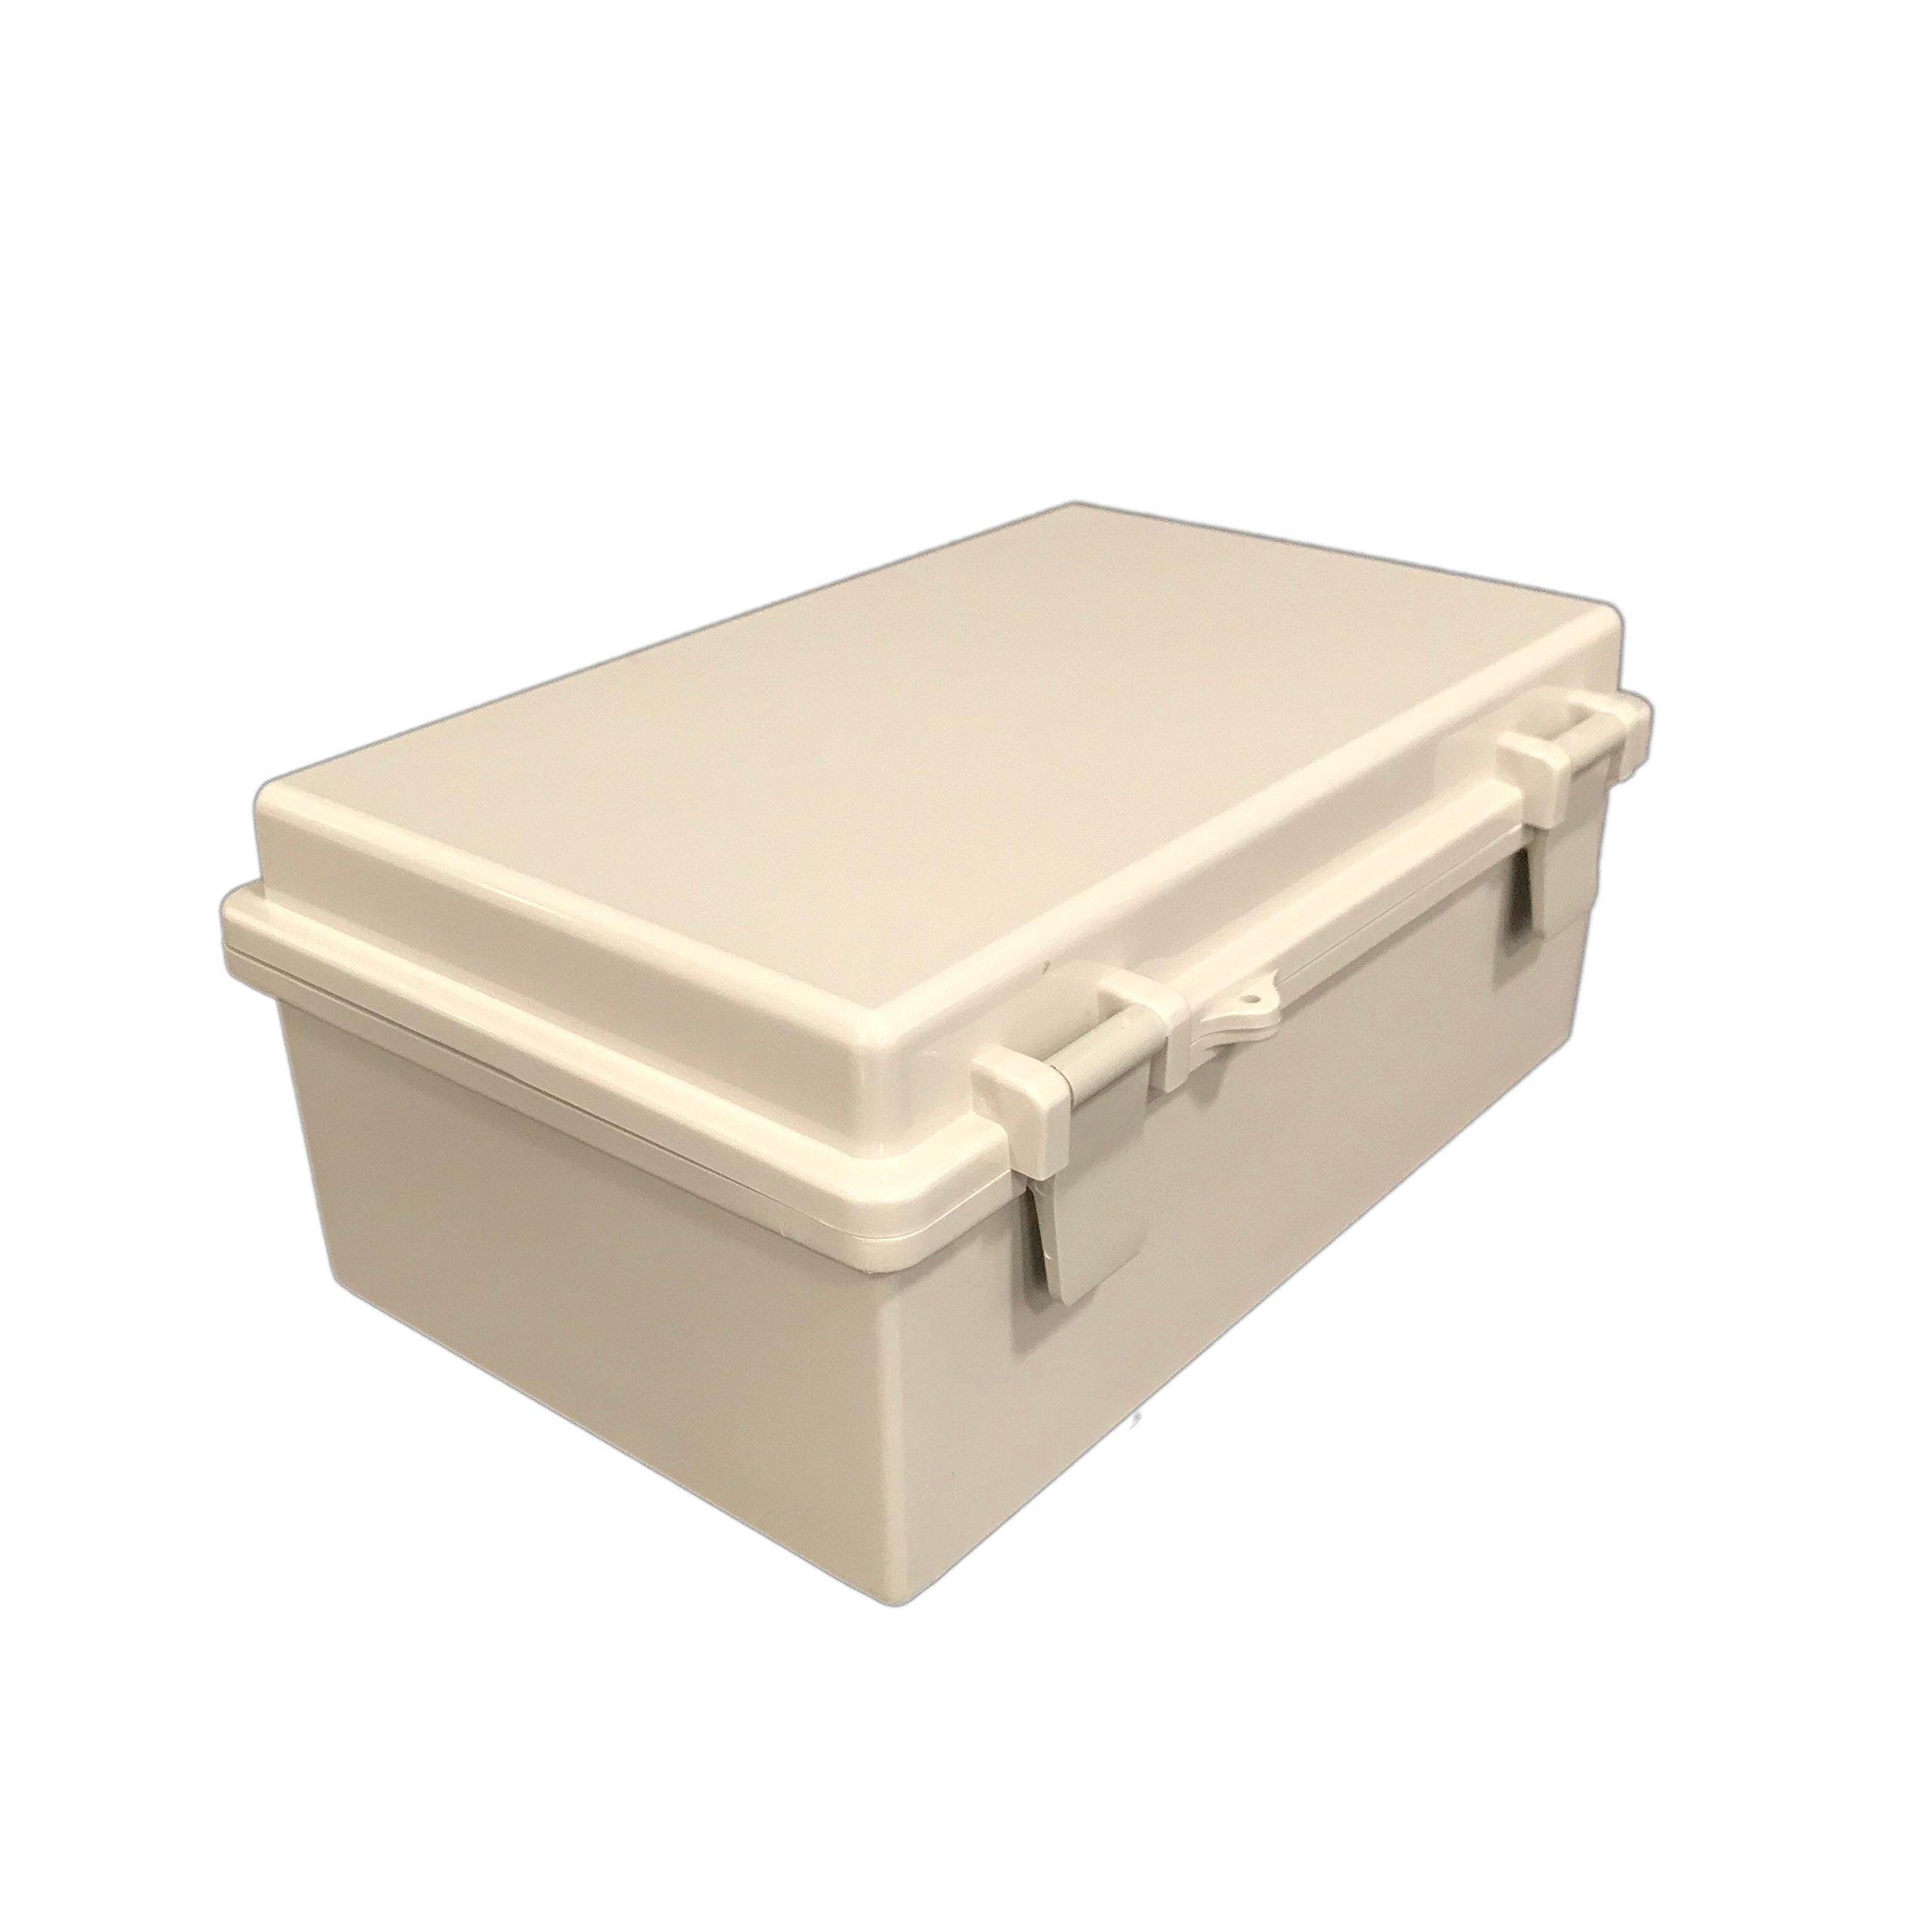 BUD Industries NBB-22241 Style B Plastic NEMA Box with Solid Indoor, 10-23/32'' Length x 6-25/32'' Width x 4-21/64'' Height, Light Gray Finish